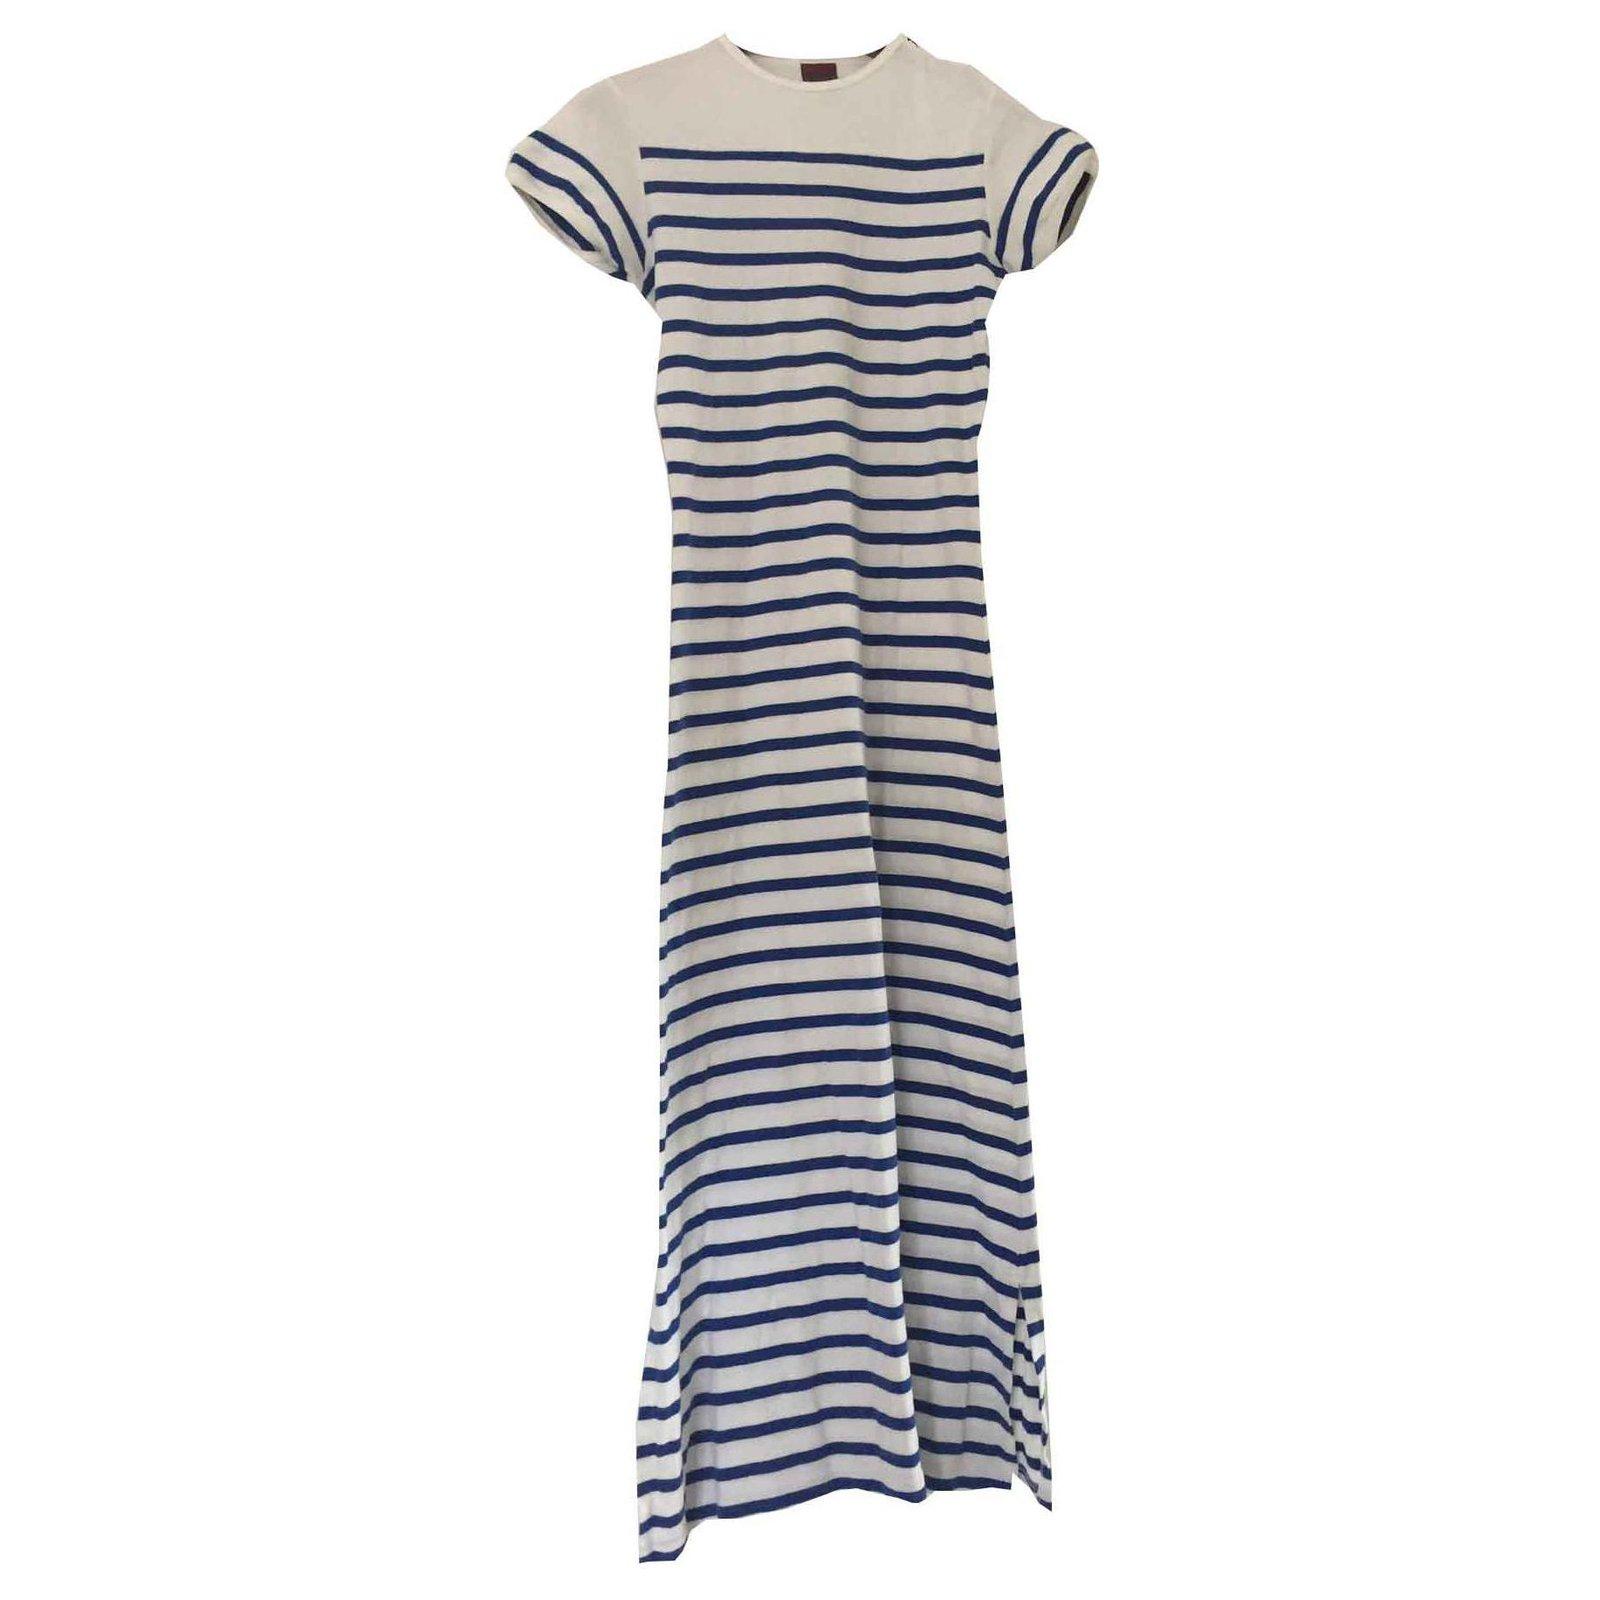 Robes Jean Paul Gaultier Robe longue mariniè